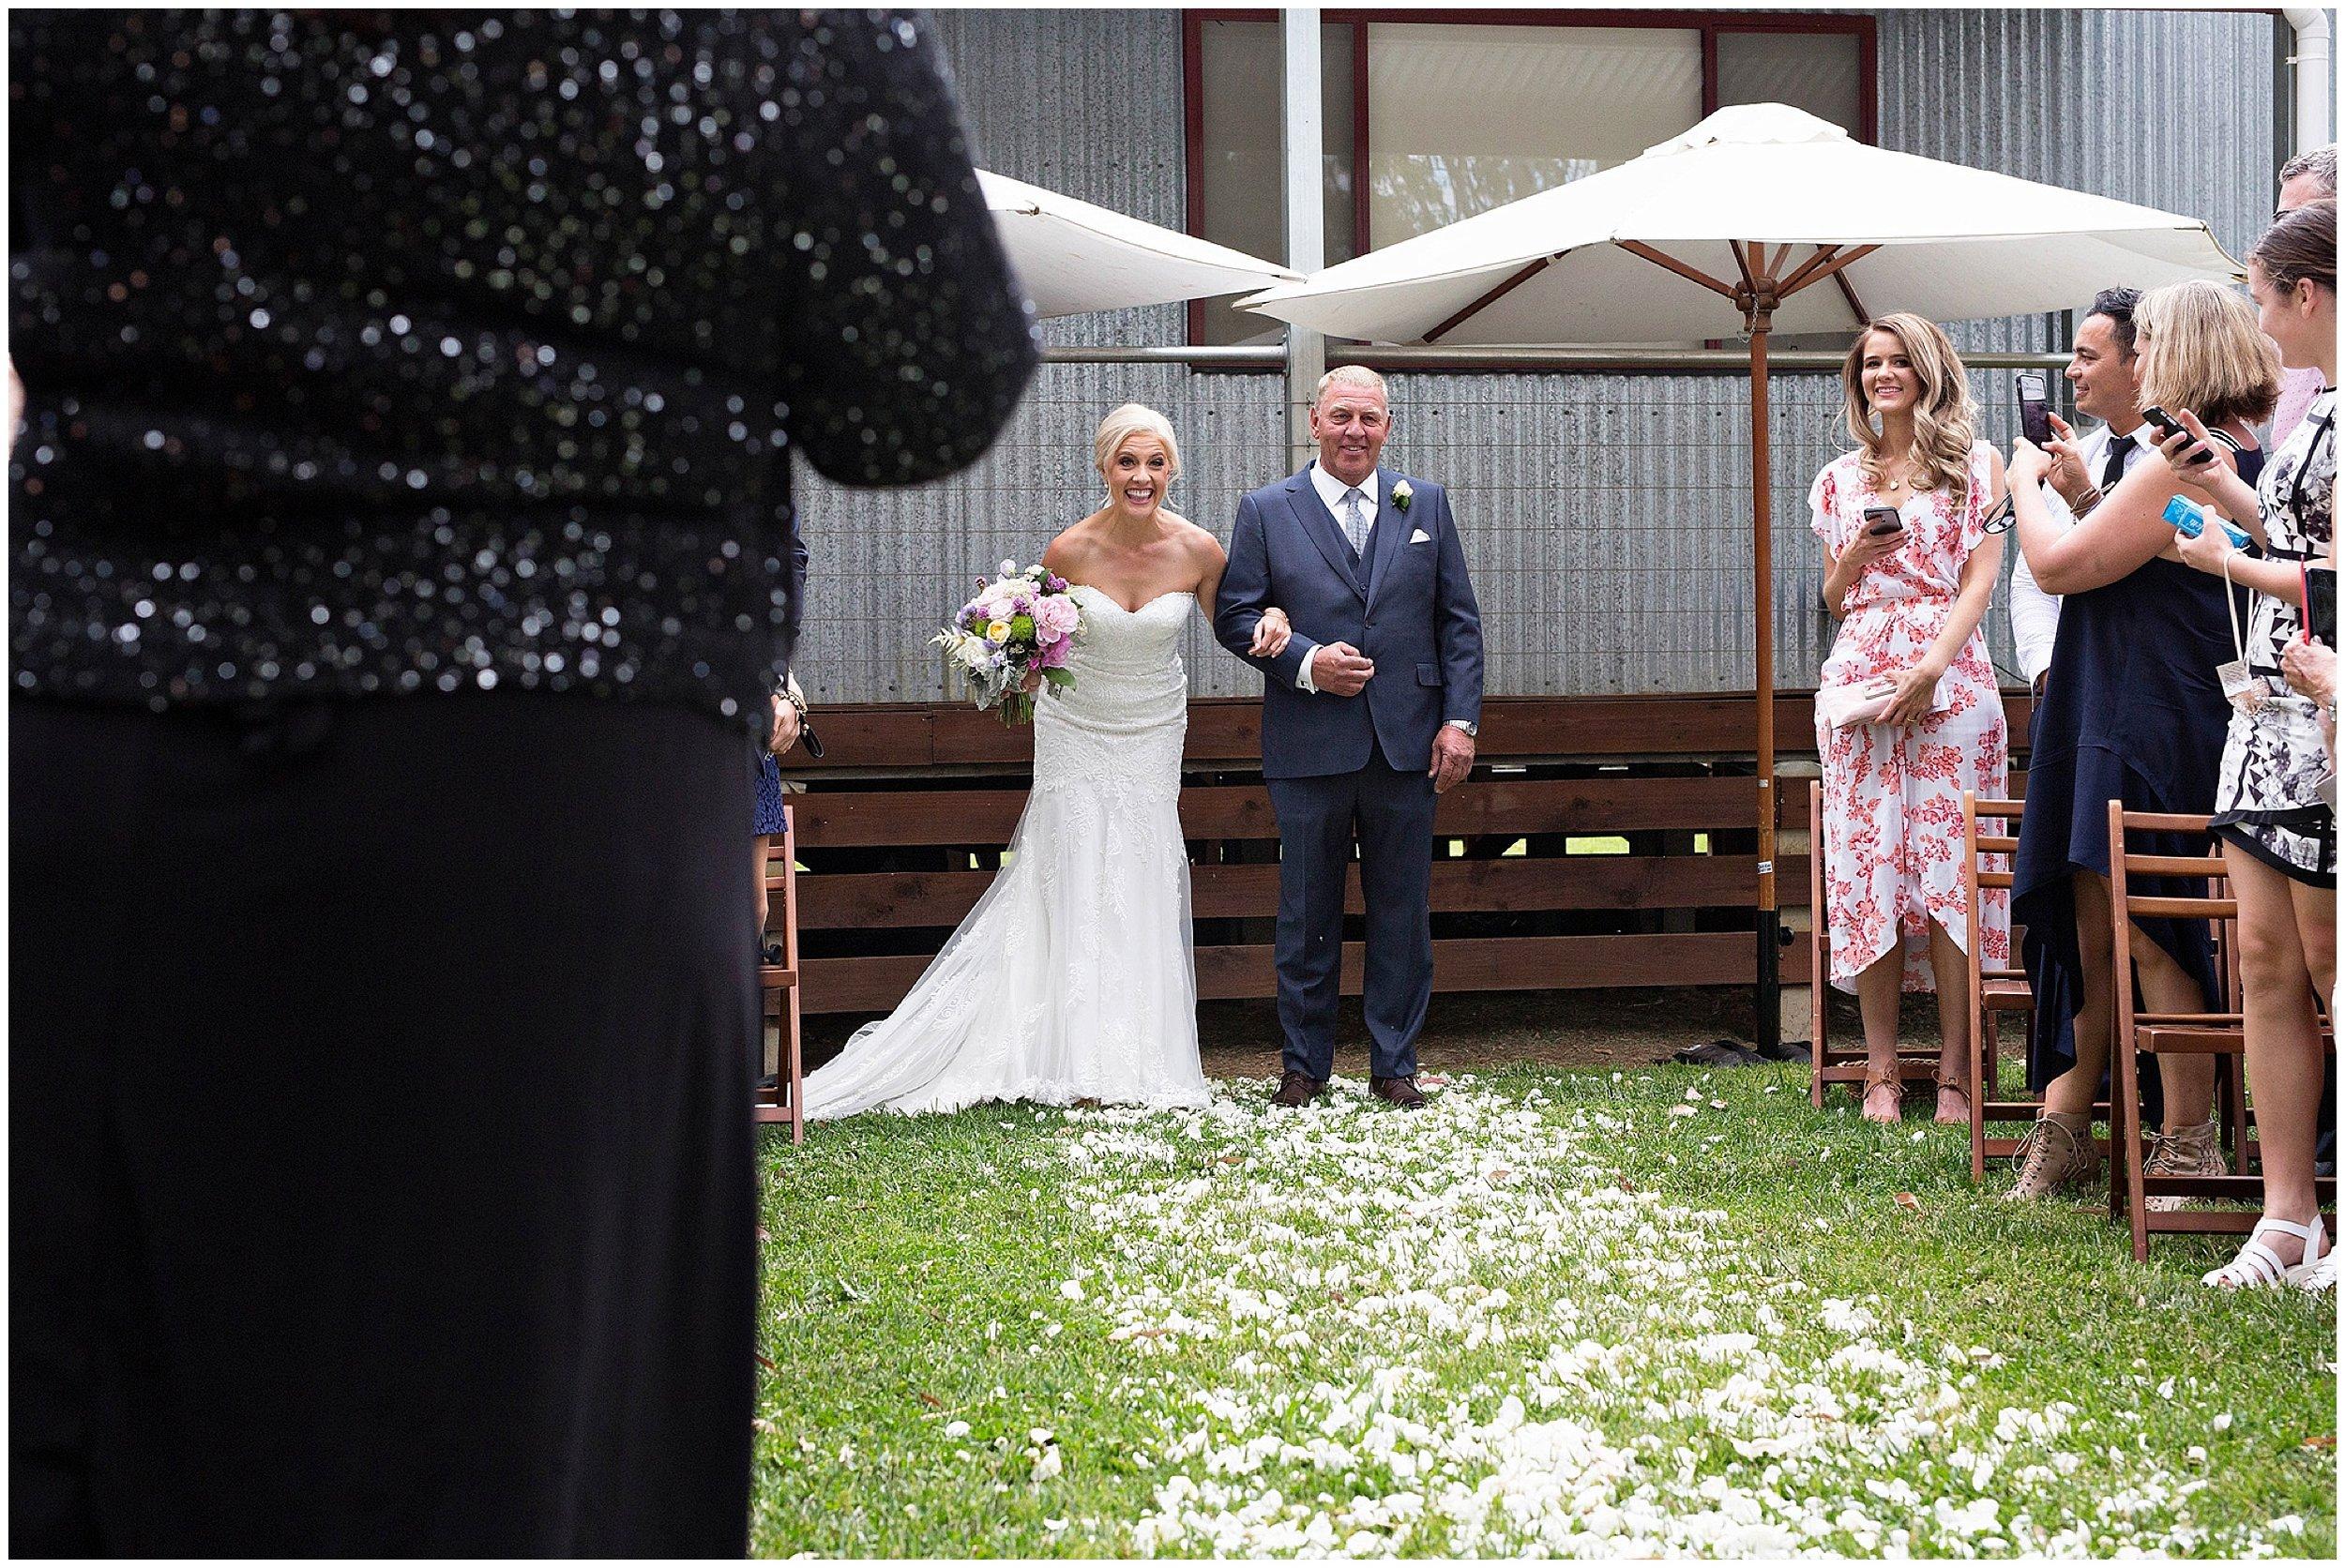 shepparton-wedding-photographer_0160.jpg